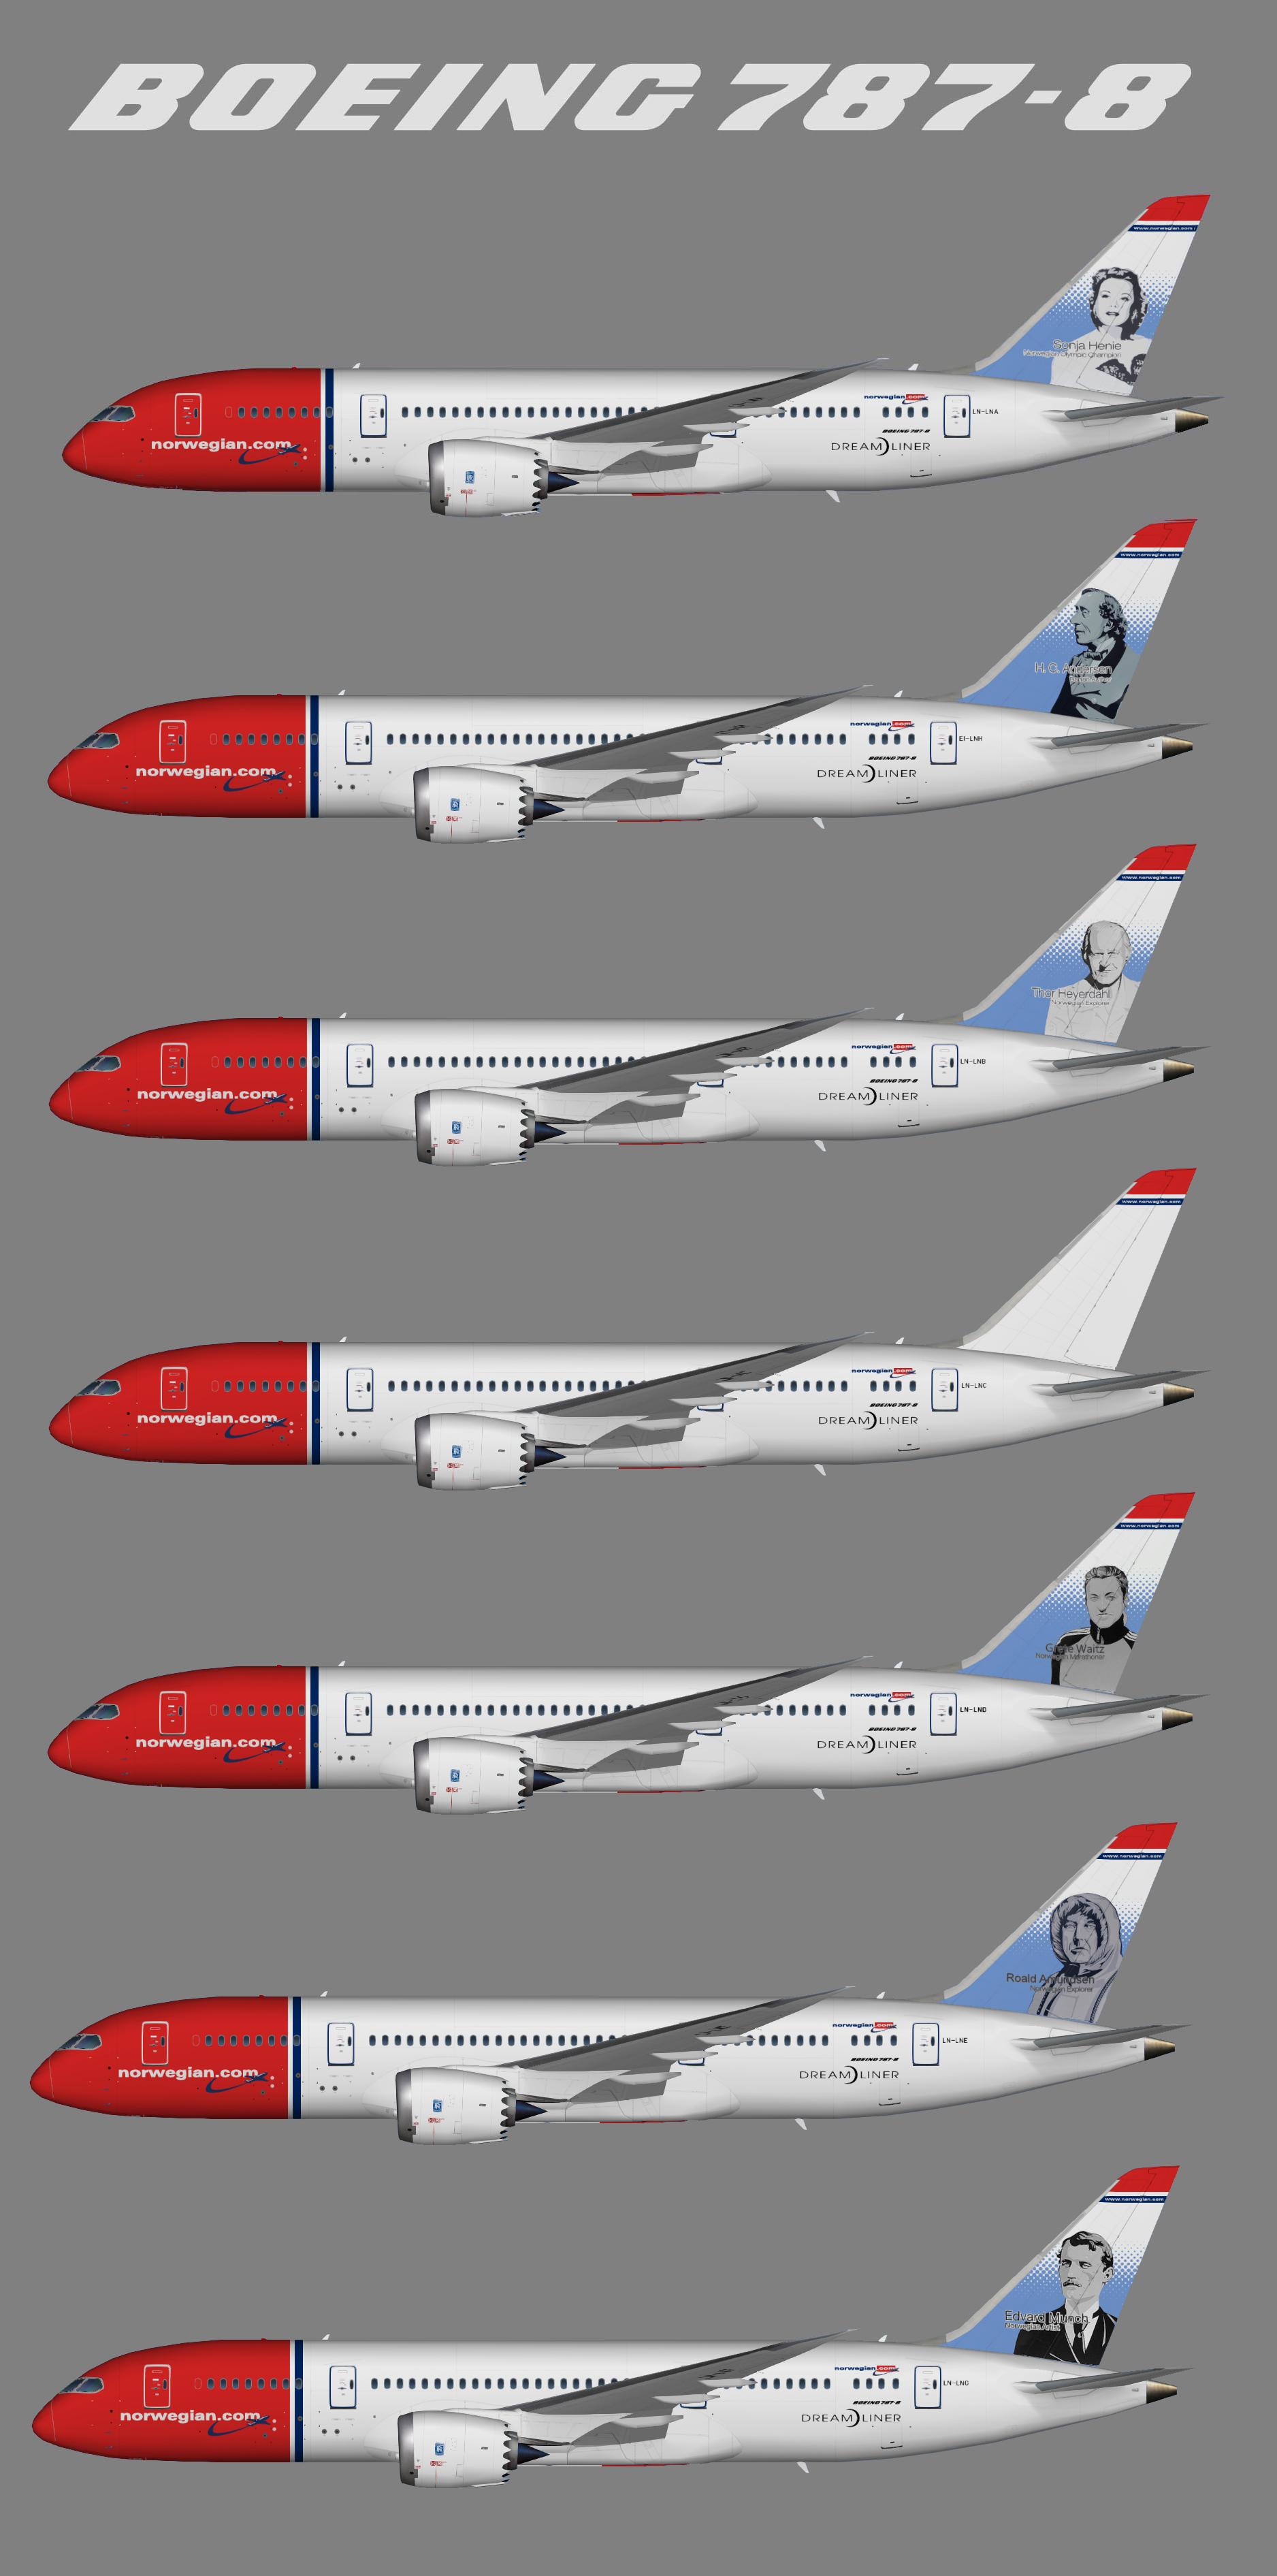 Norwegian Longhaul Boeing 787-8